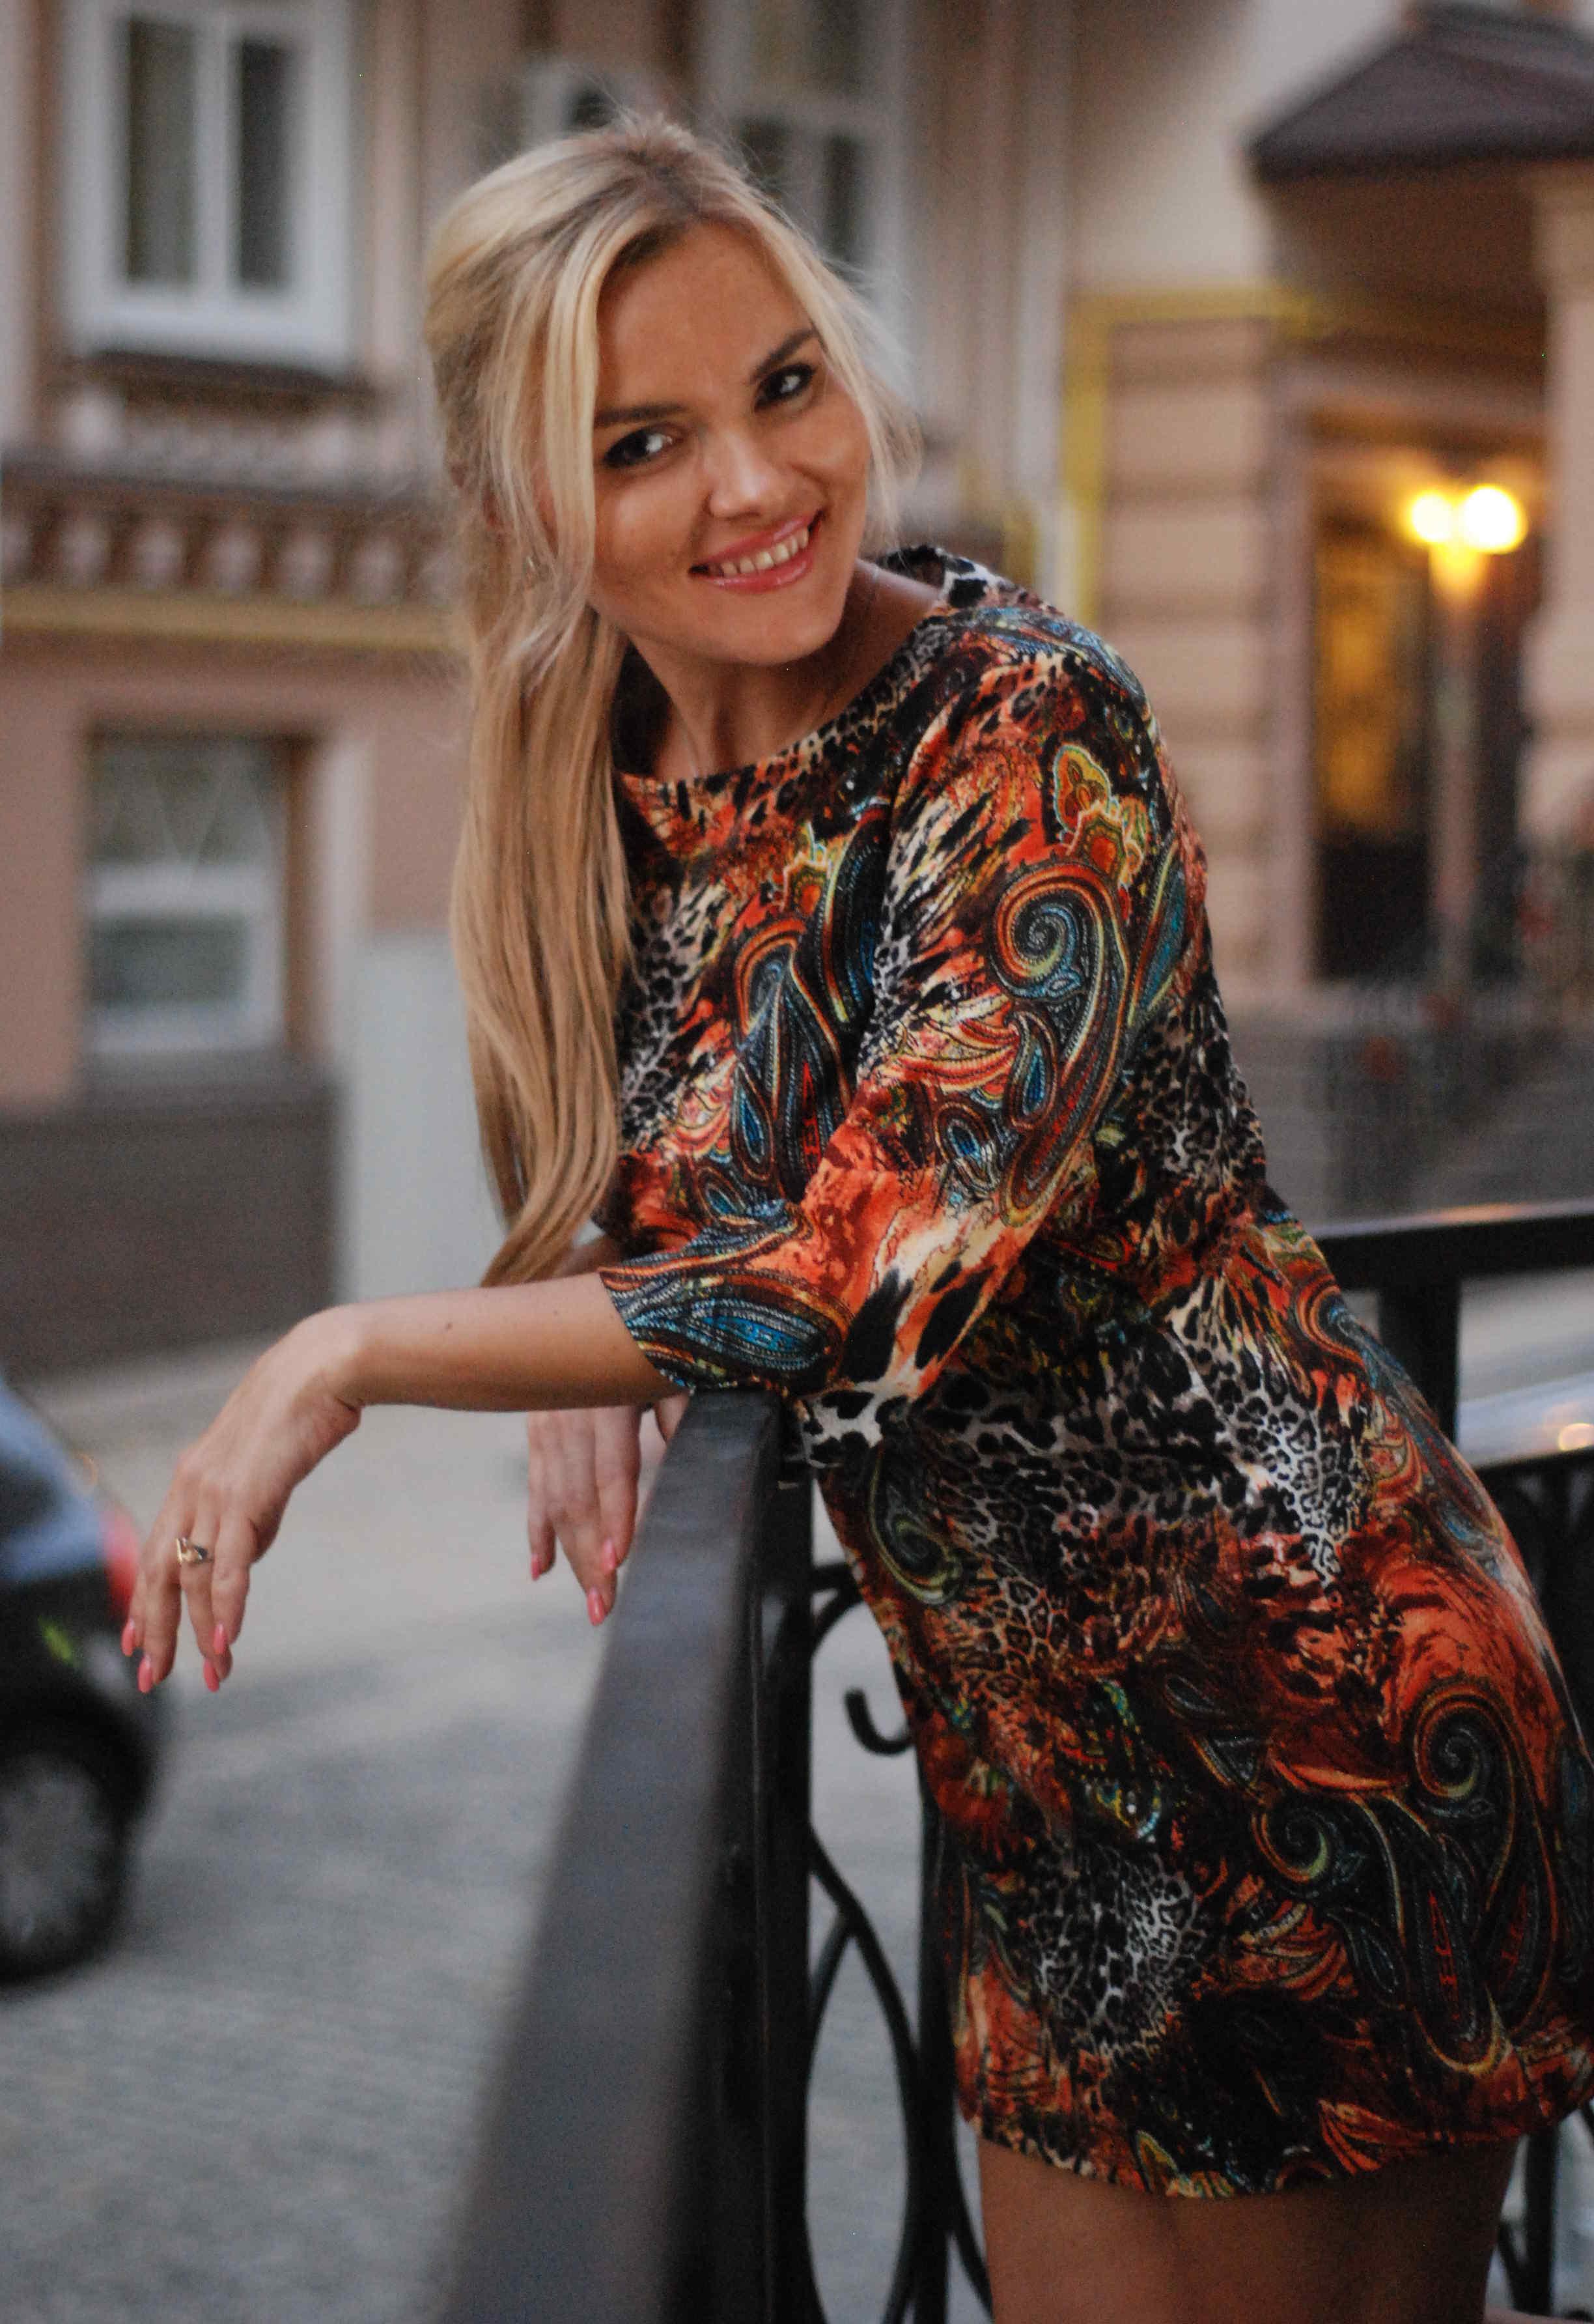 Ukraine Brides Agency - Meet Beautiful Single Ukrainian Women